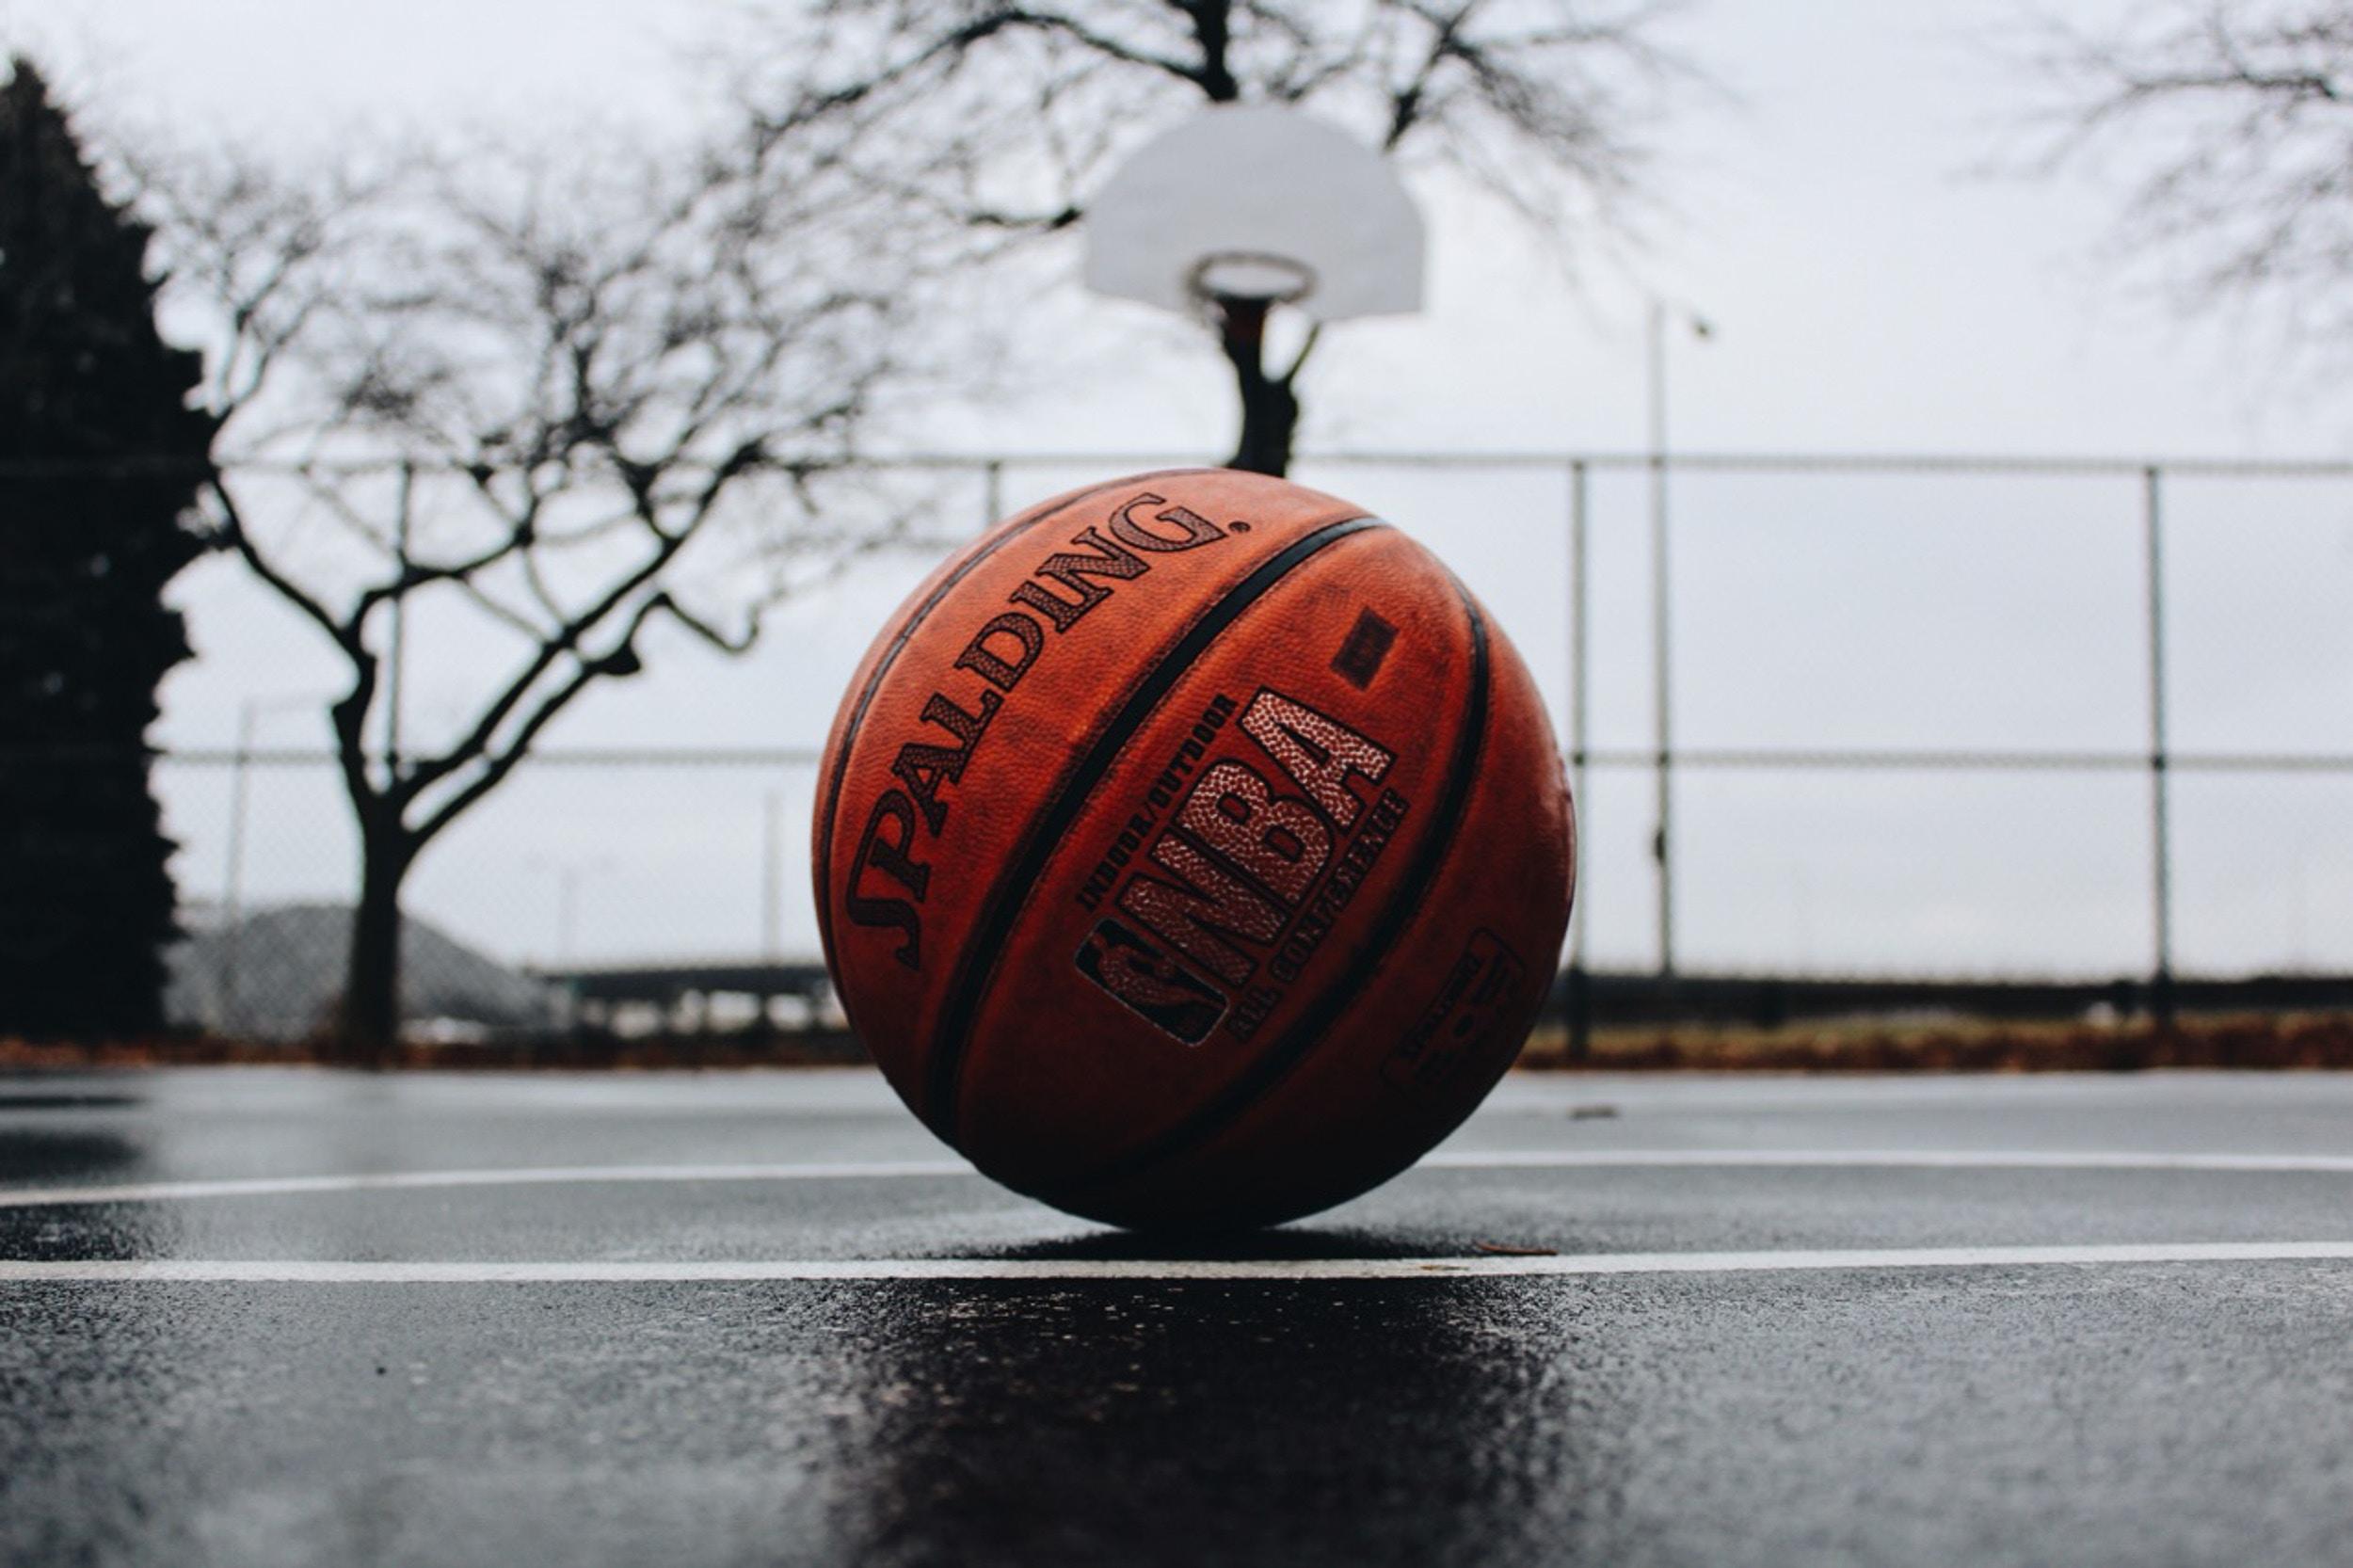 Bitmain Sponsors NBA's Houston Rockets Through Subsidiary Antpool